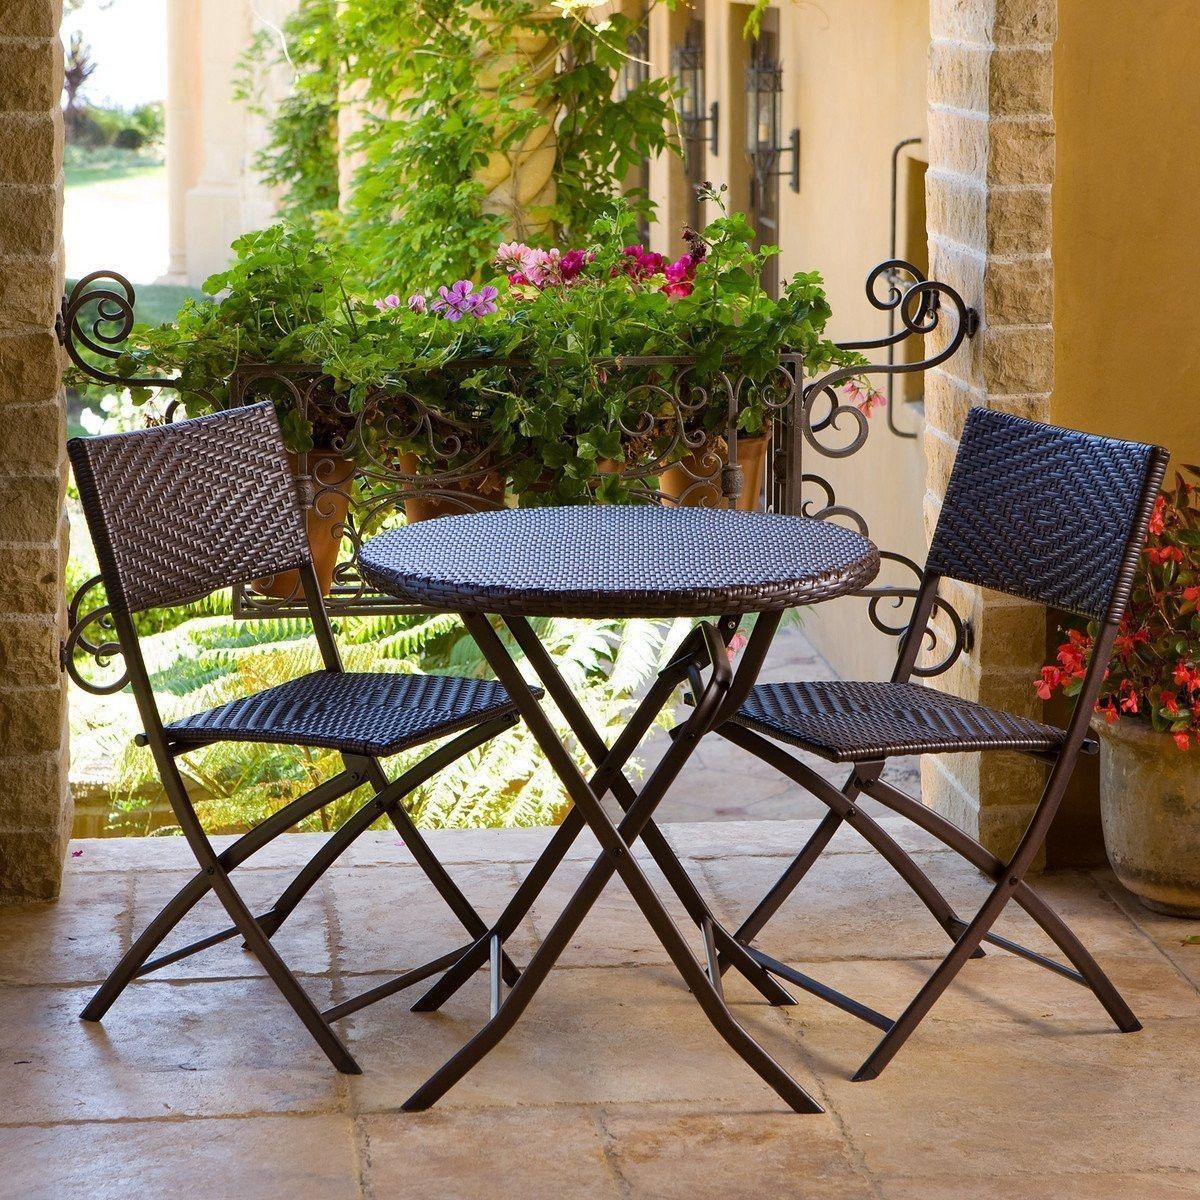 3 Piece Outdoor Bistro Patio Furniture Set In Espresso Bistro